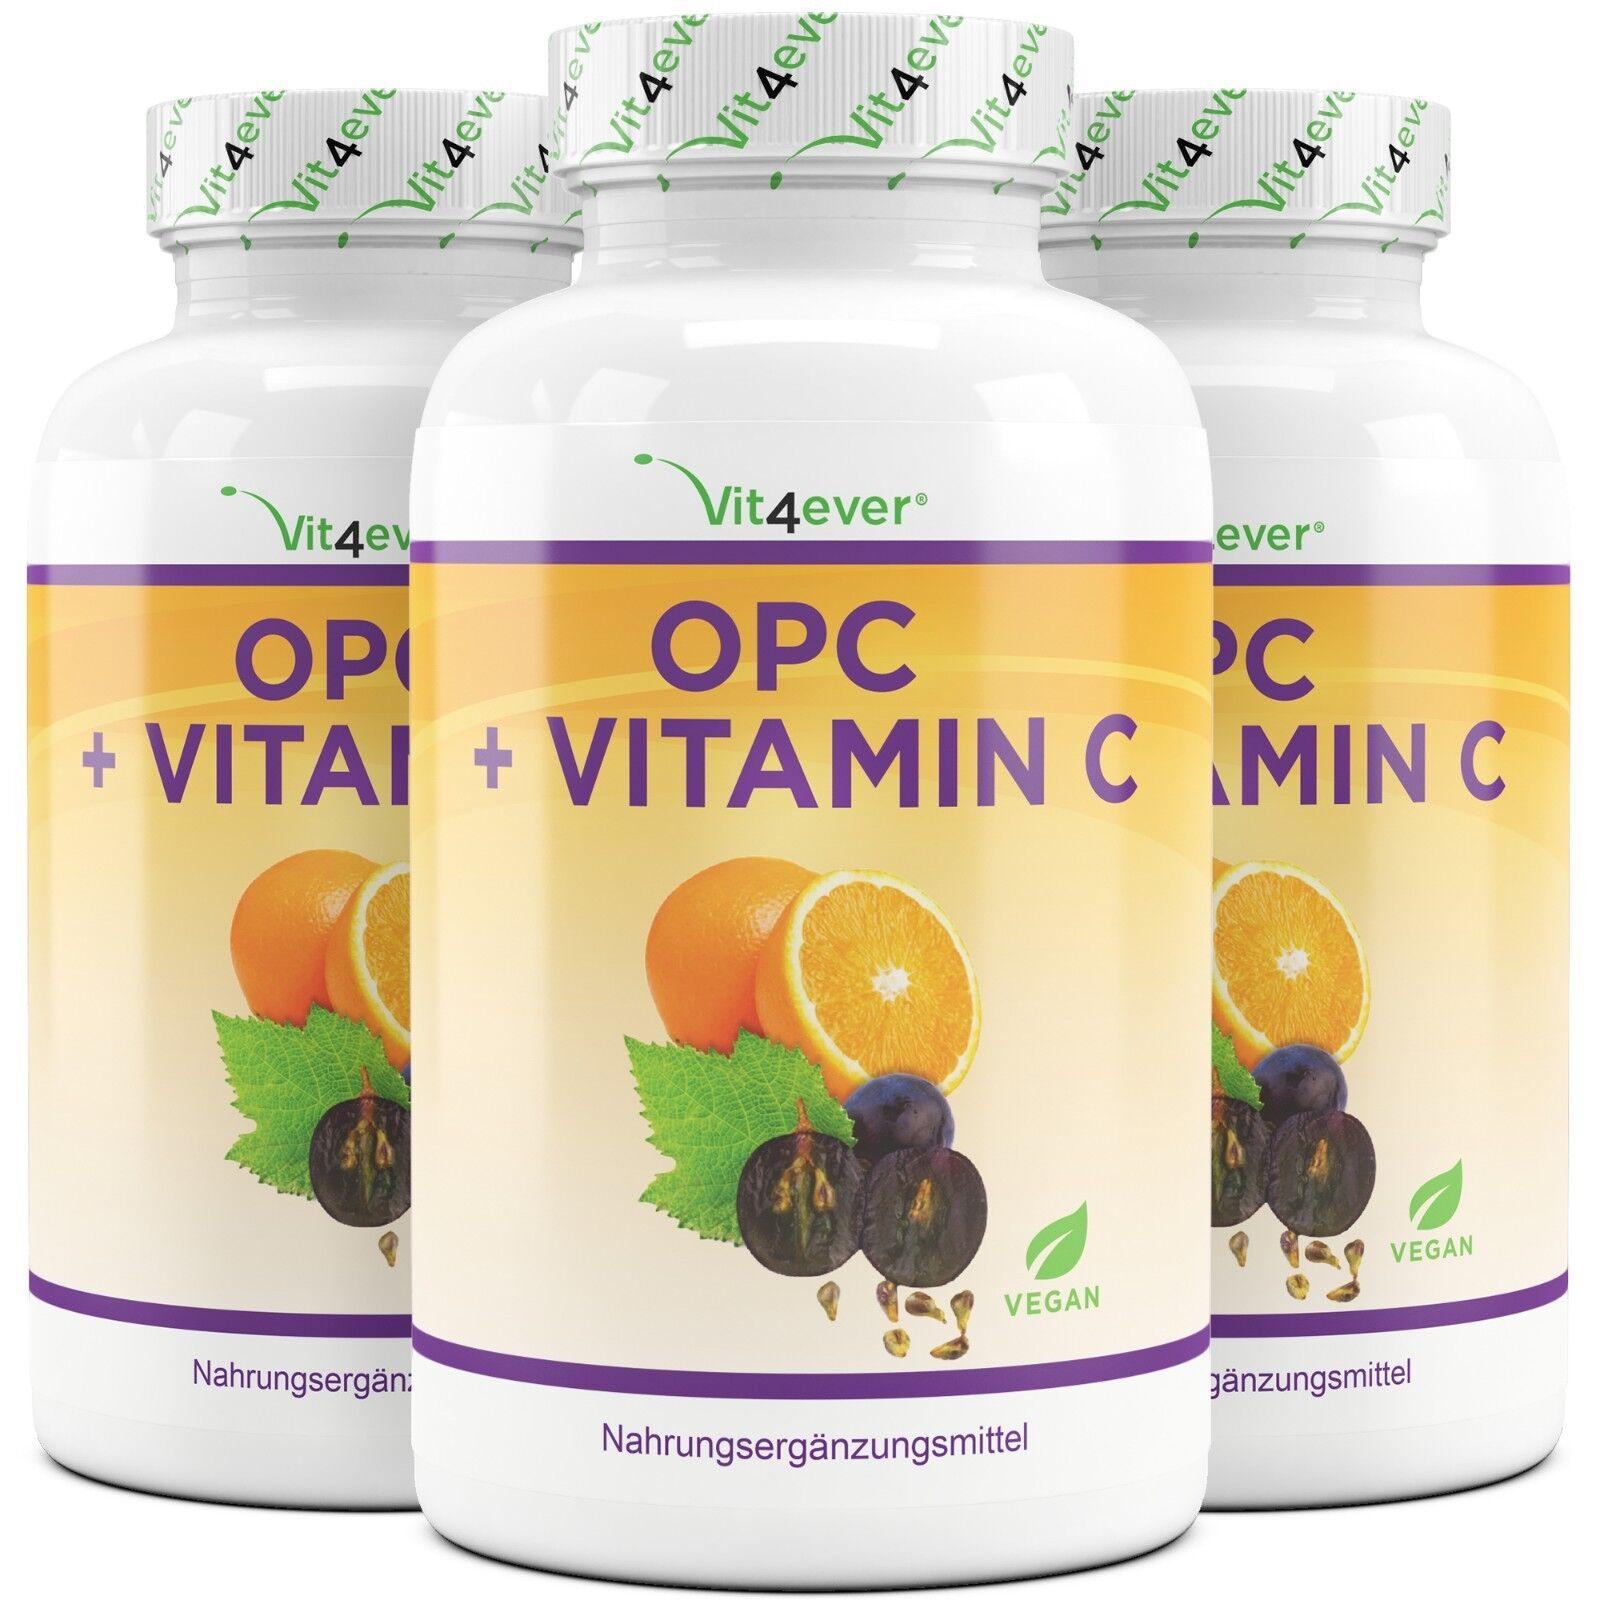 3X OPC C 1200 + Vitamin C OPC = 540 Kapseln - 600 mg - Traubenkernextrakt bis 95% OPC 635b38